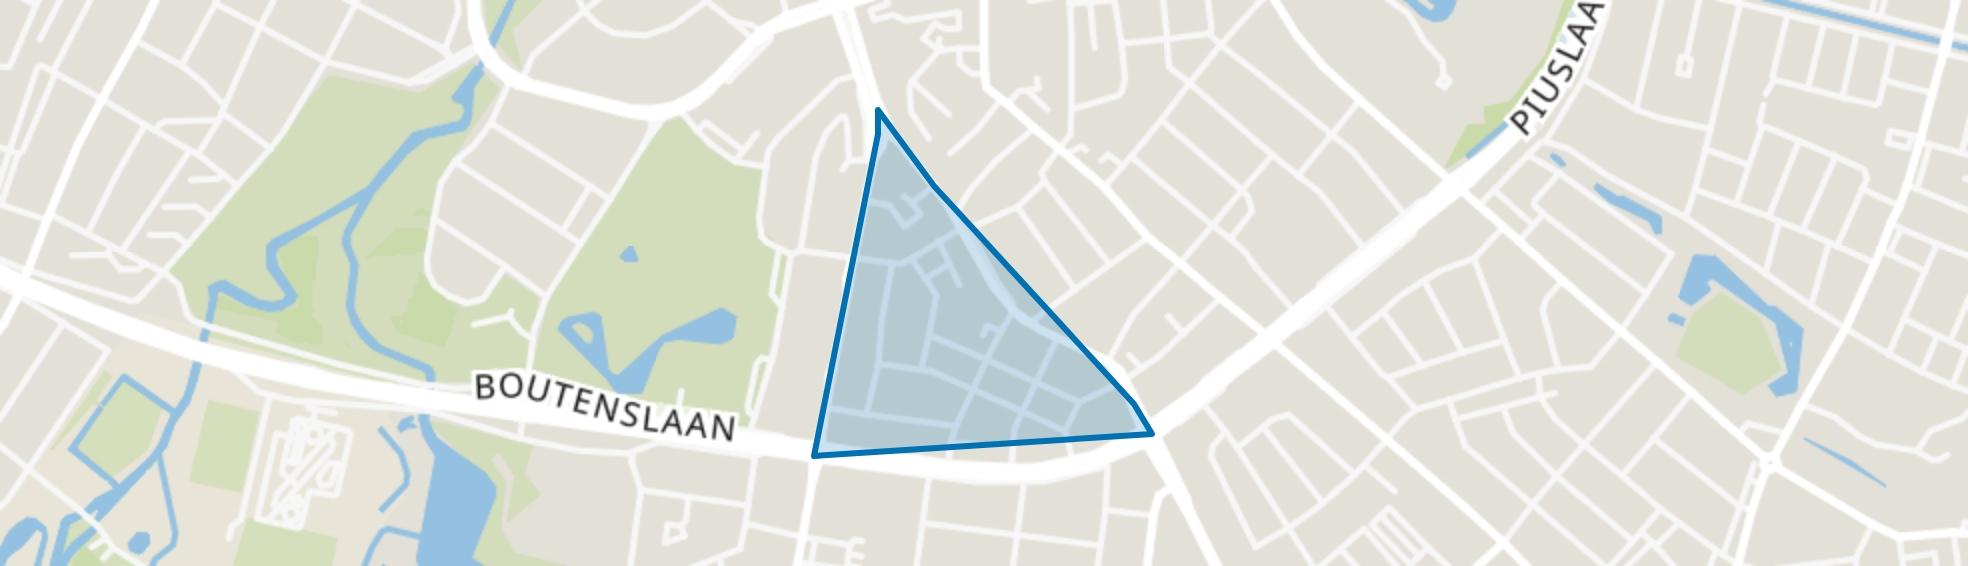 Bloemenplein, Eindhoven map